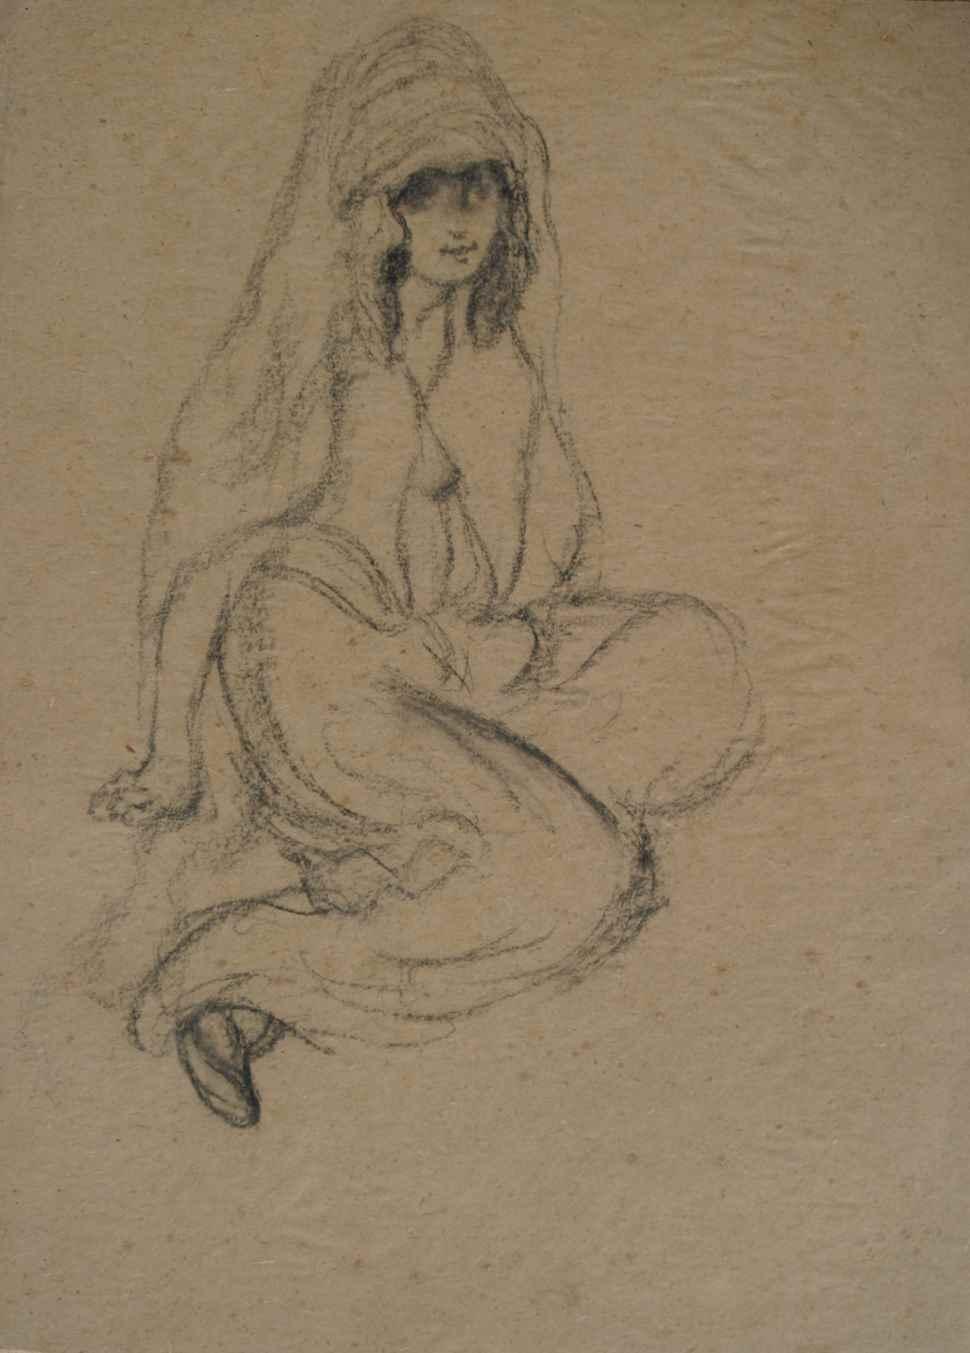 Oriental Woman - Georges Manzana Pissarro (1871 - 1961)